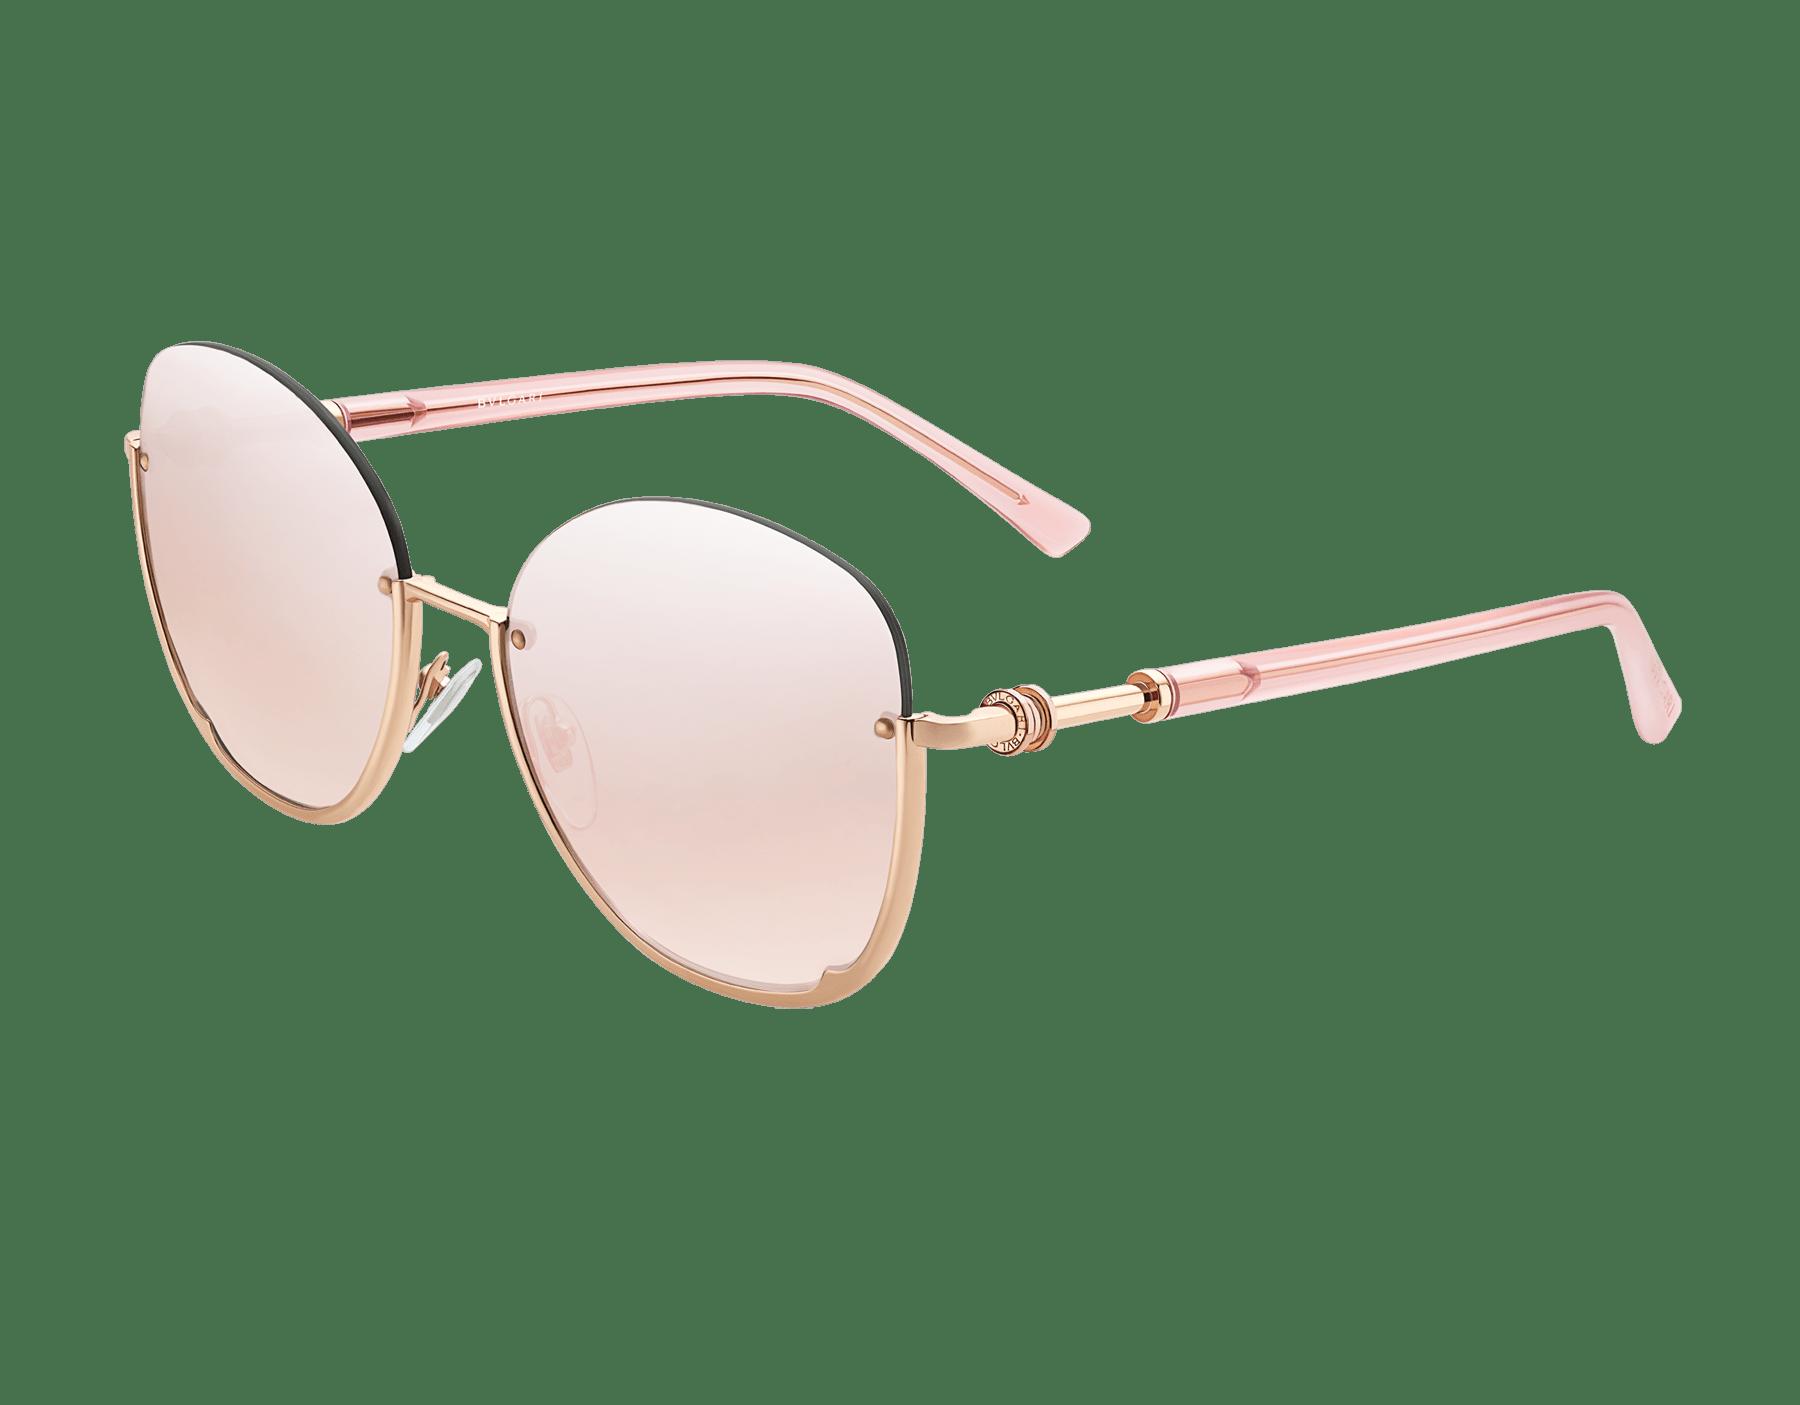 Runde Bvlgari B.zero1 Halbrand-Sonnenbrille aus Metall. 903821 image 1